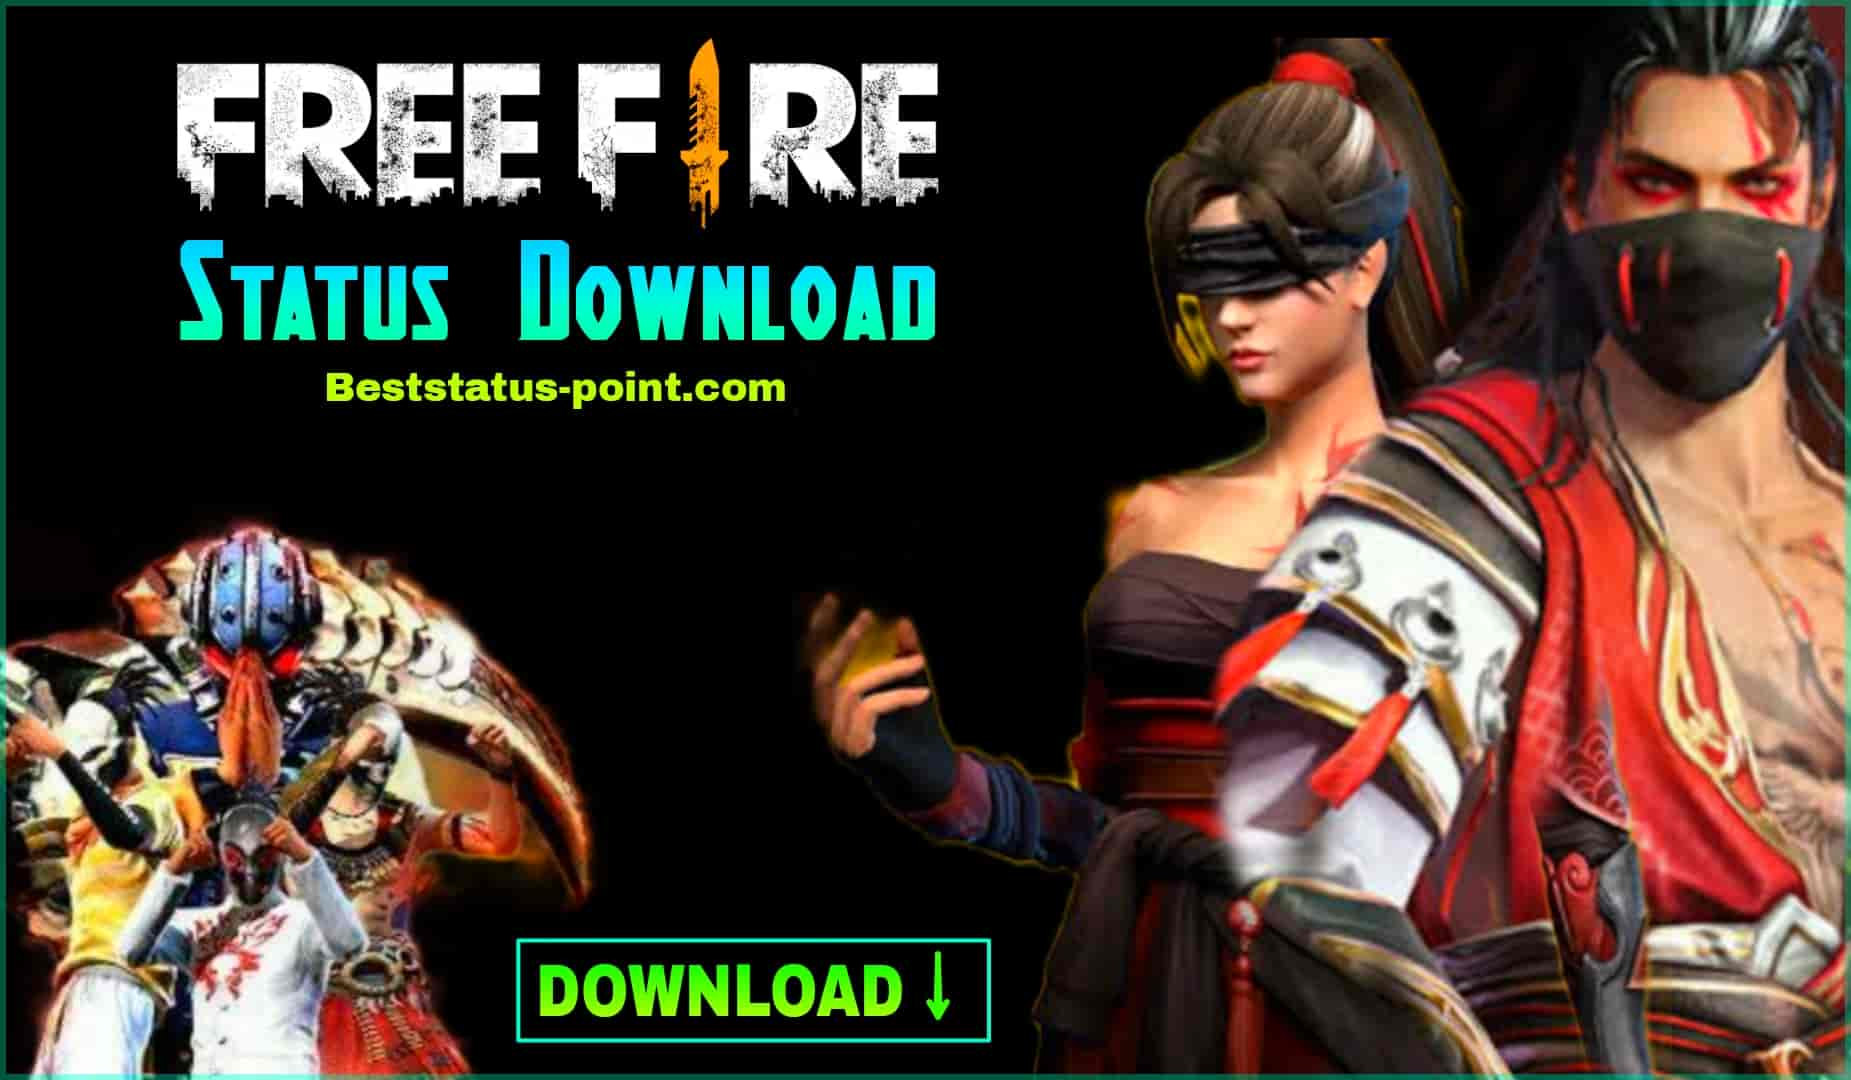 Freefire Whatsapp Status Video